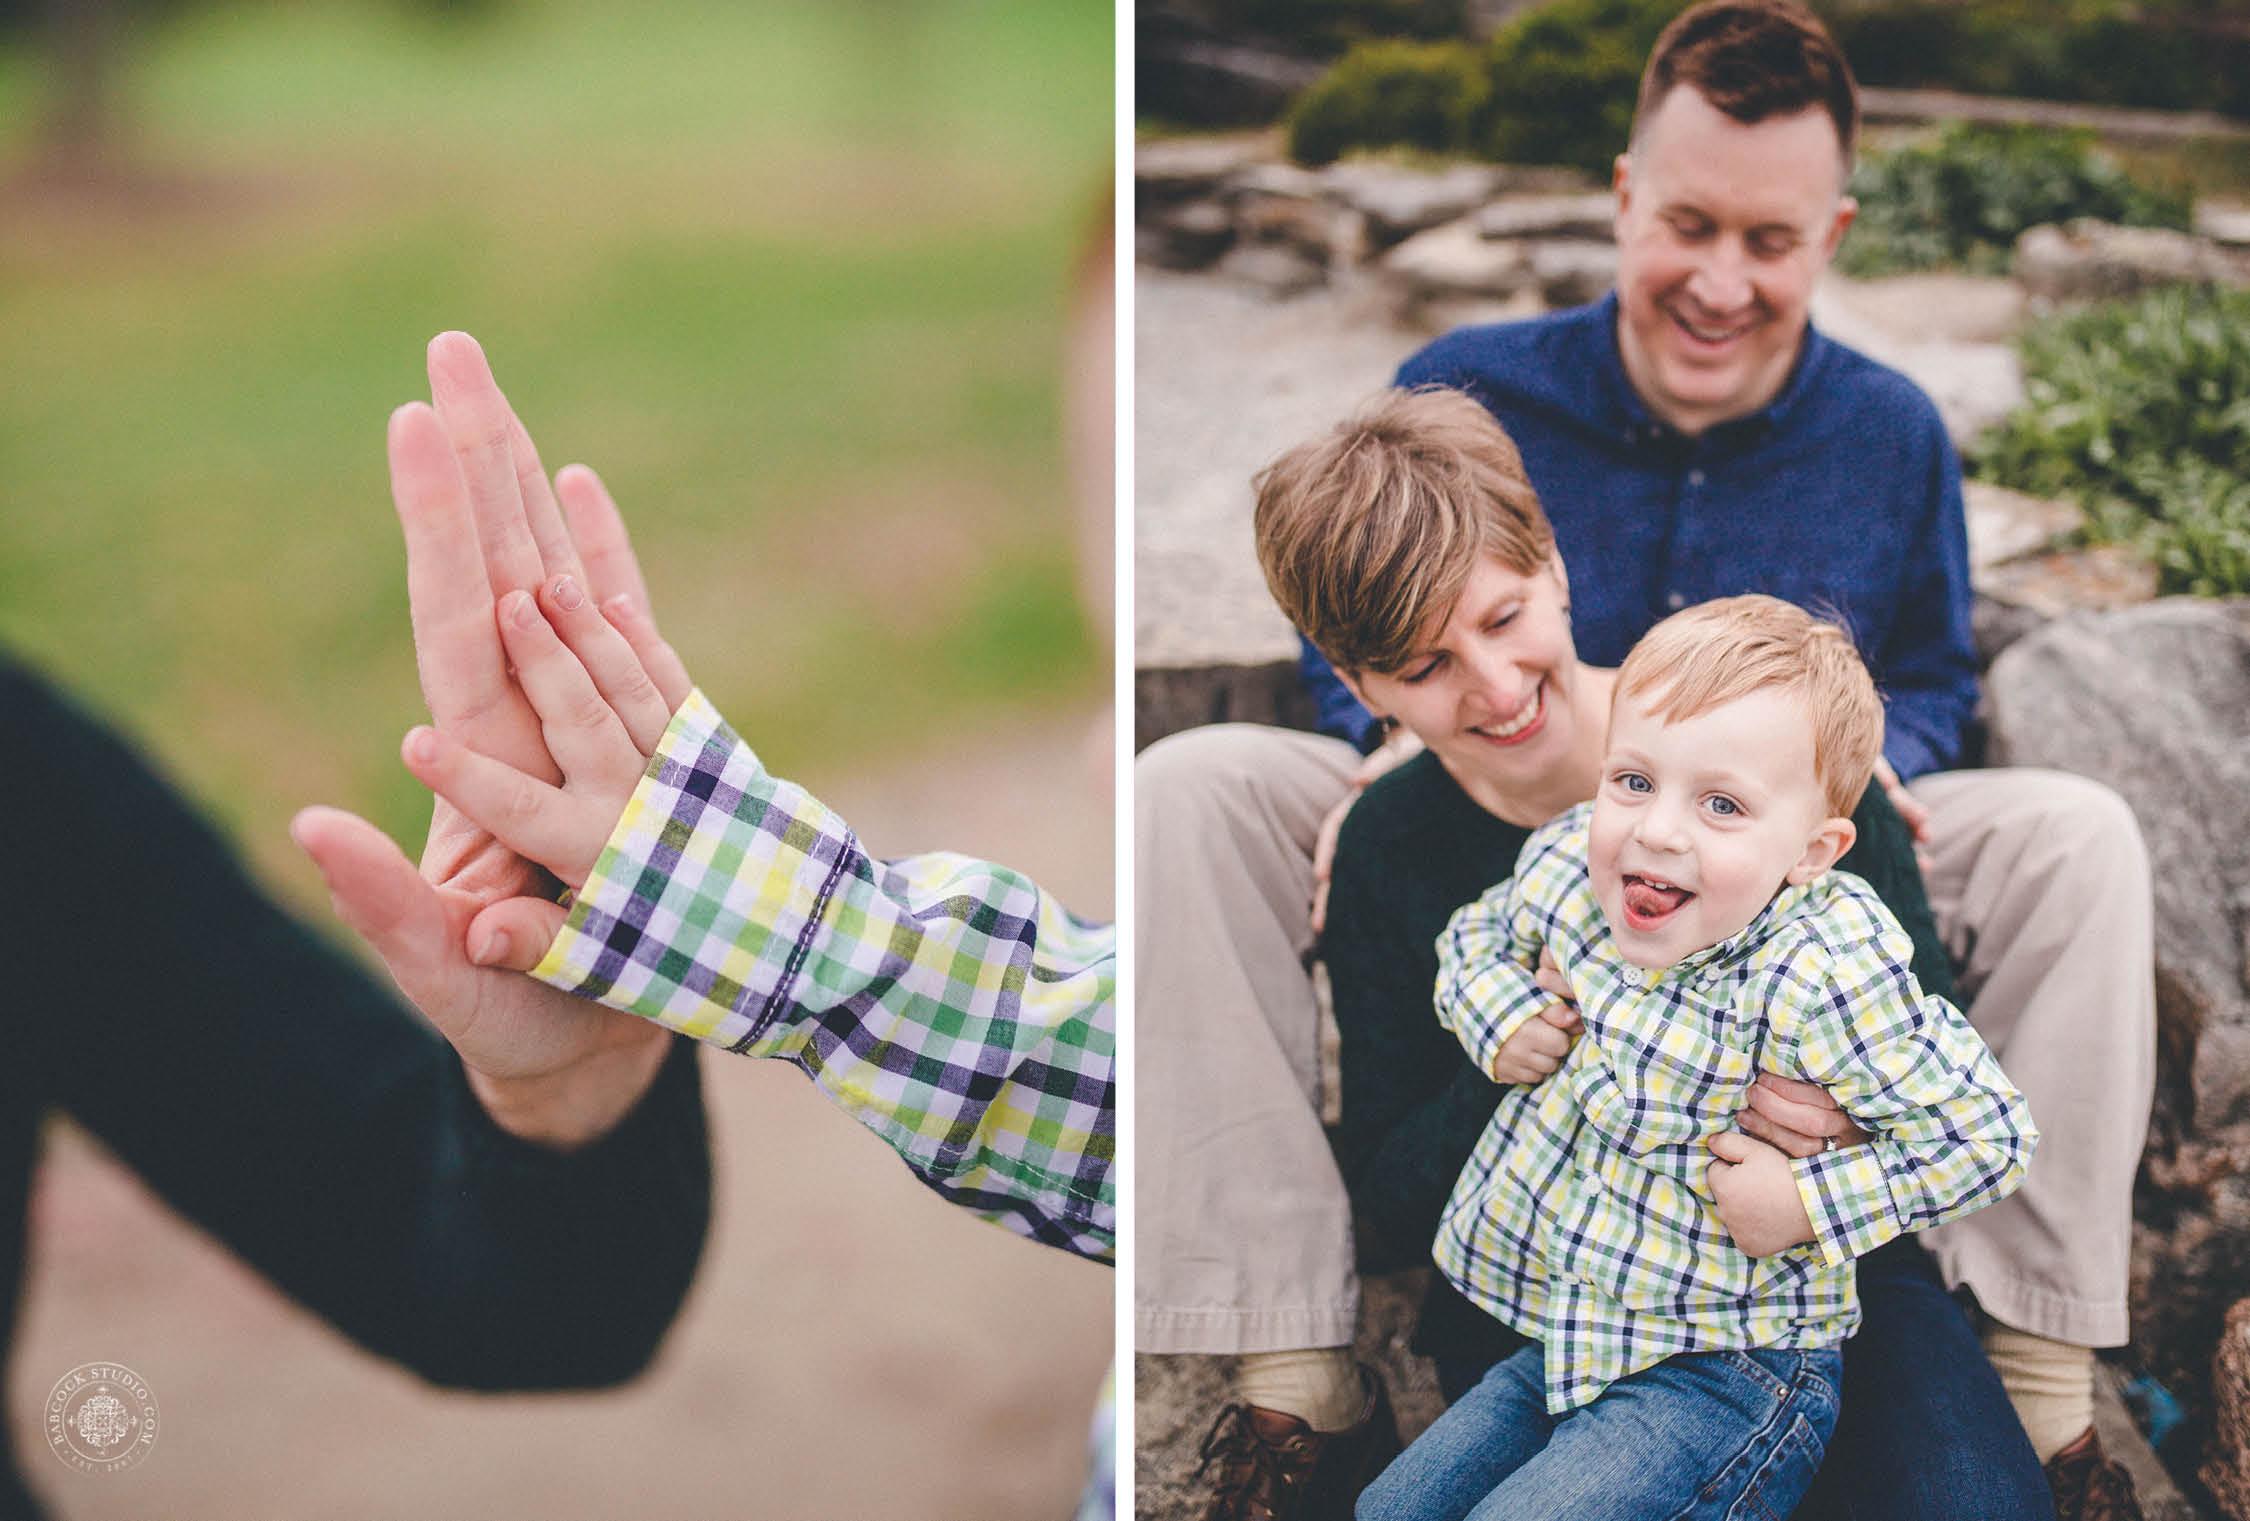 meyer-famly-children-photographer-dayton-ohio-10.jpg